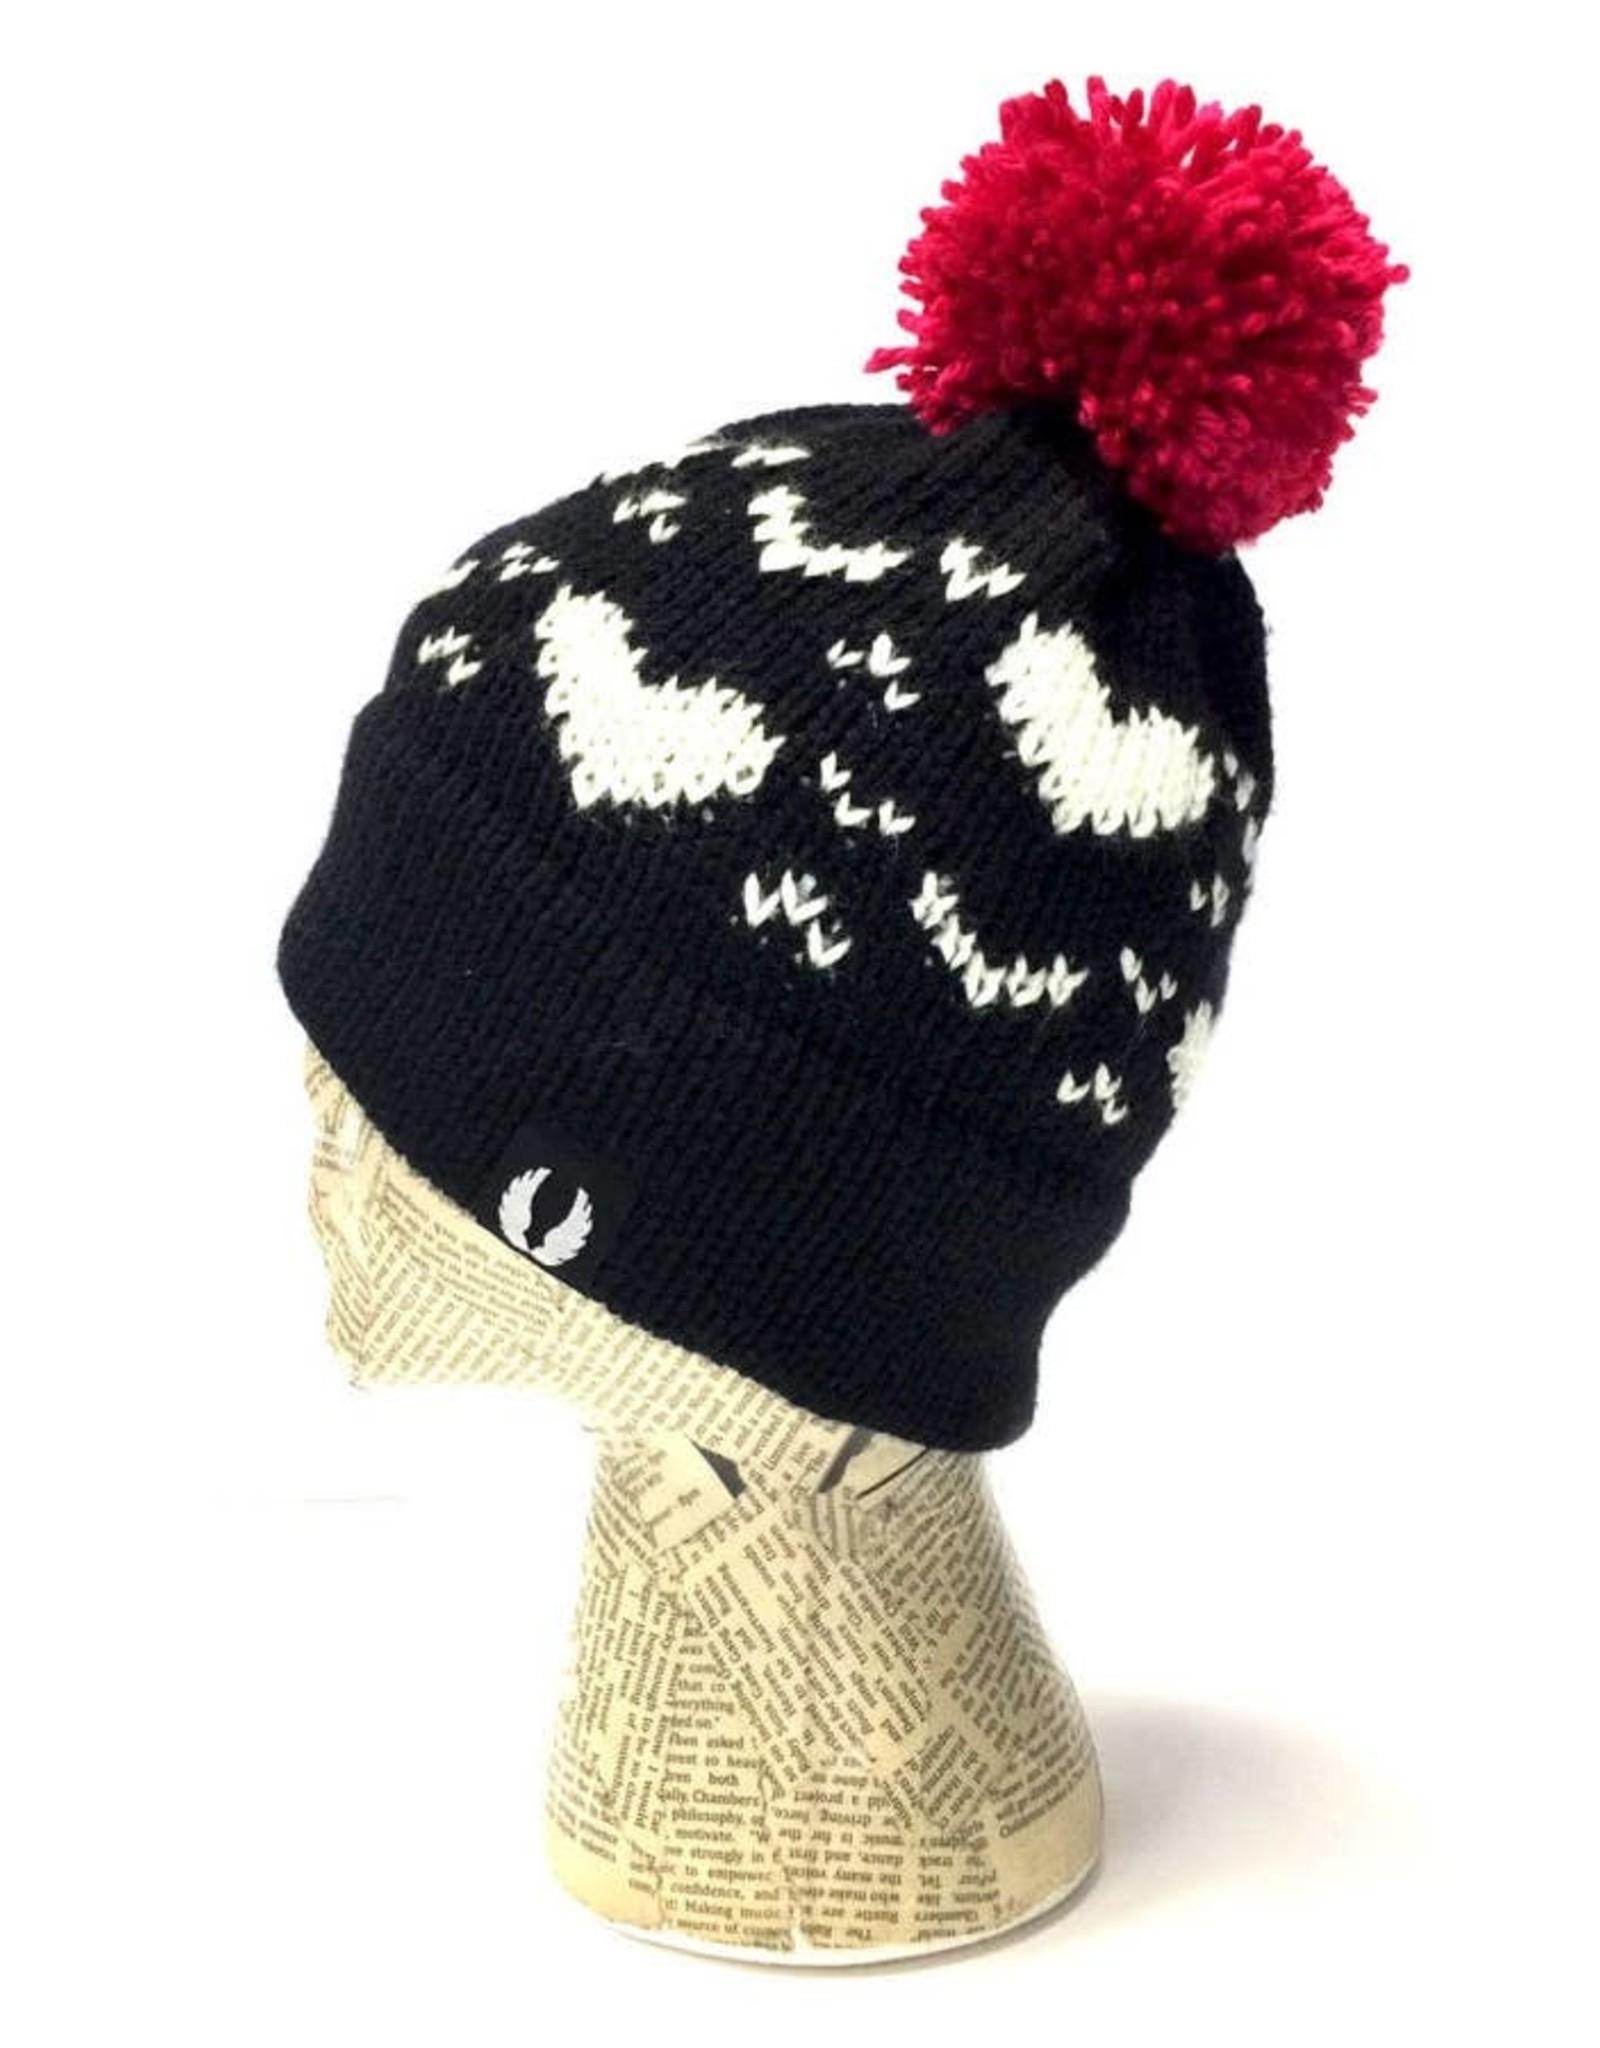 Hat: Sweet Heart Beanie